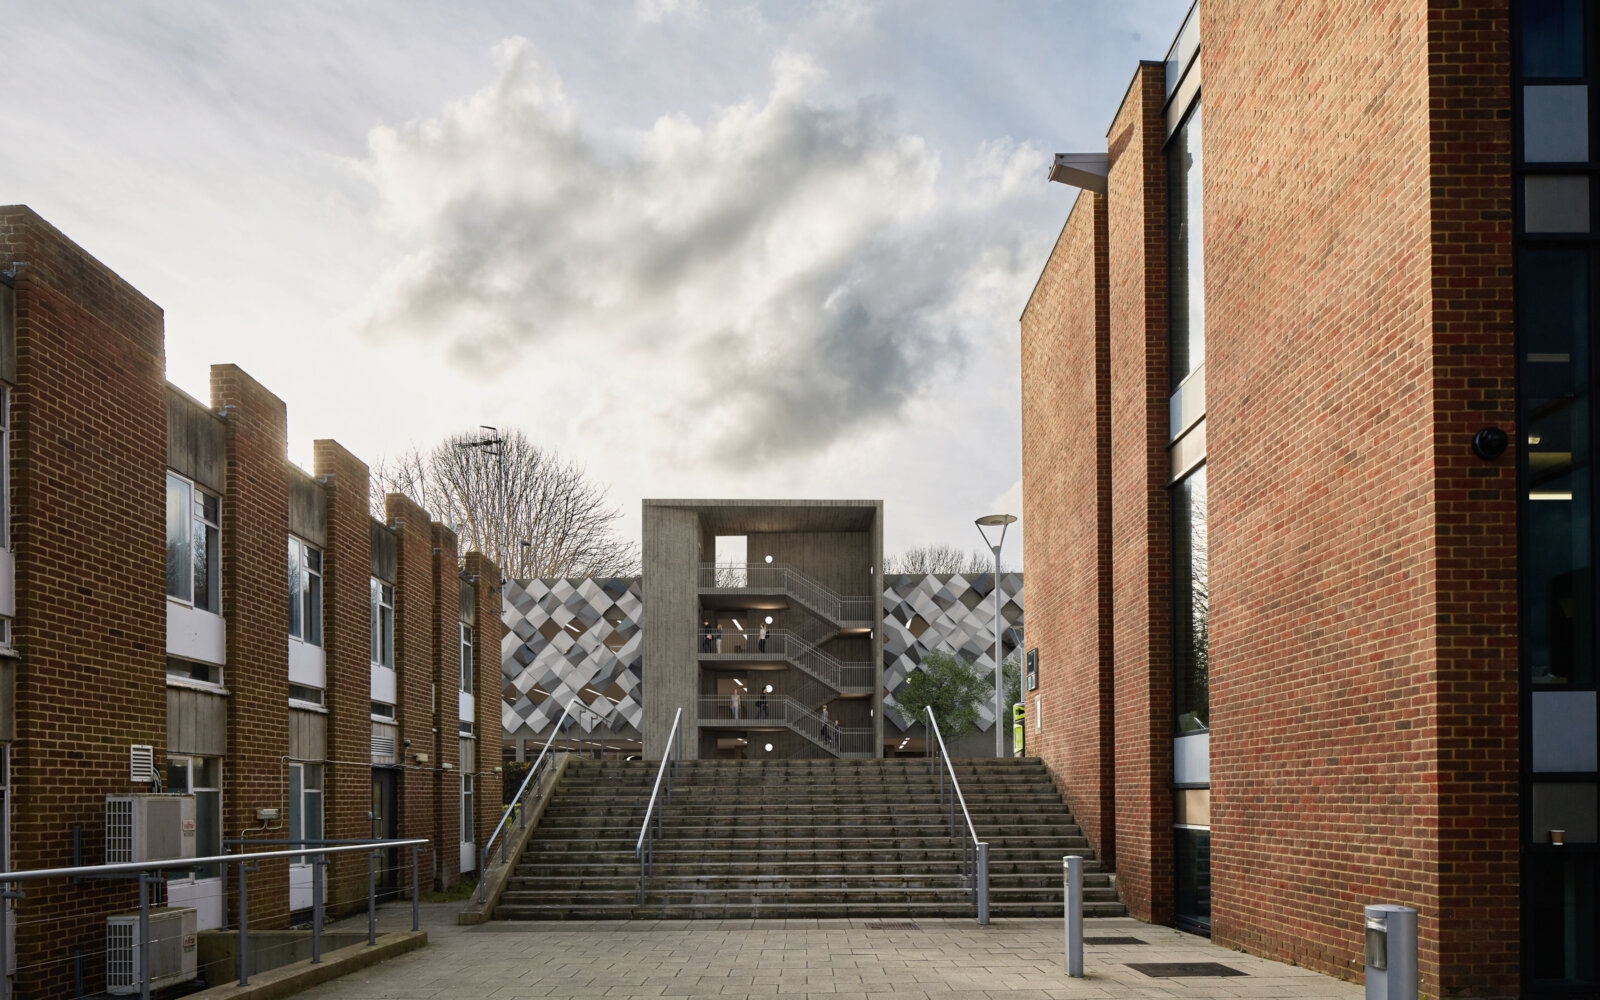 University of Sussex multi storey car park